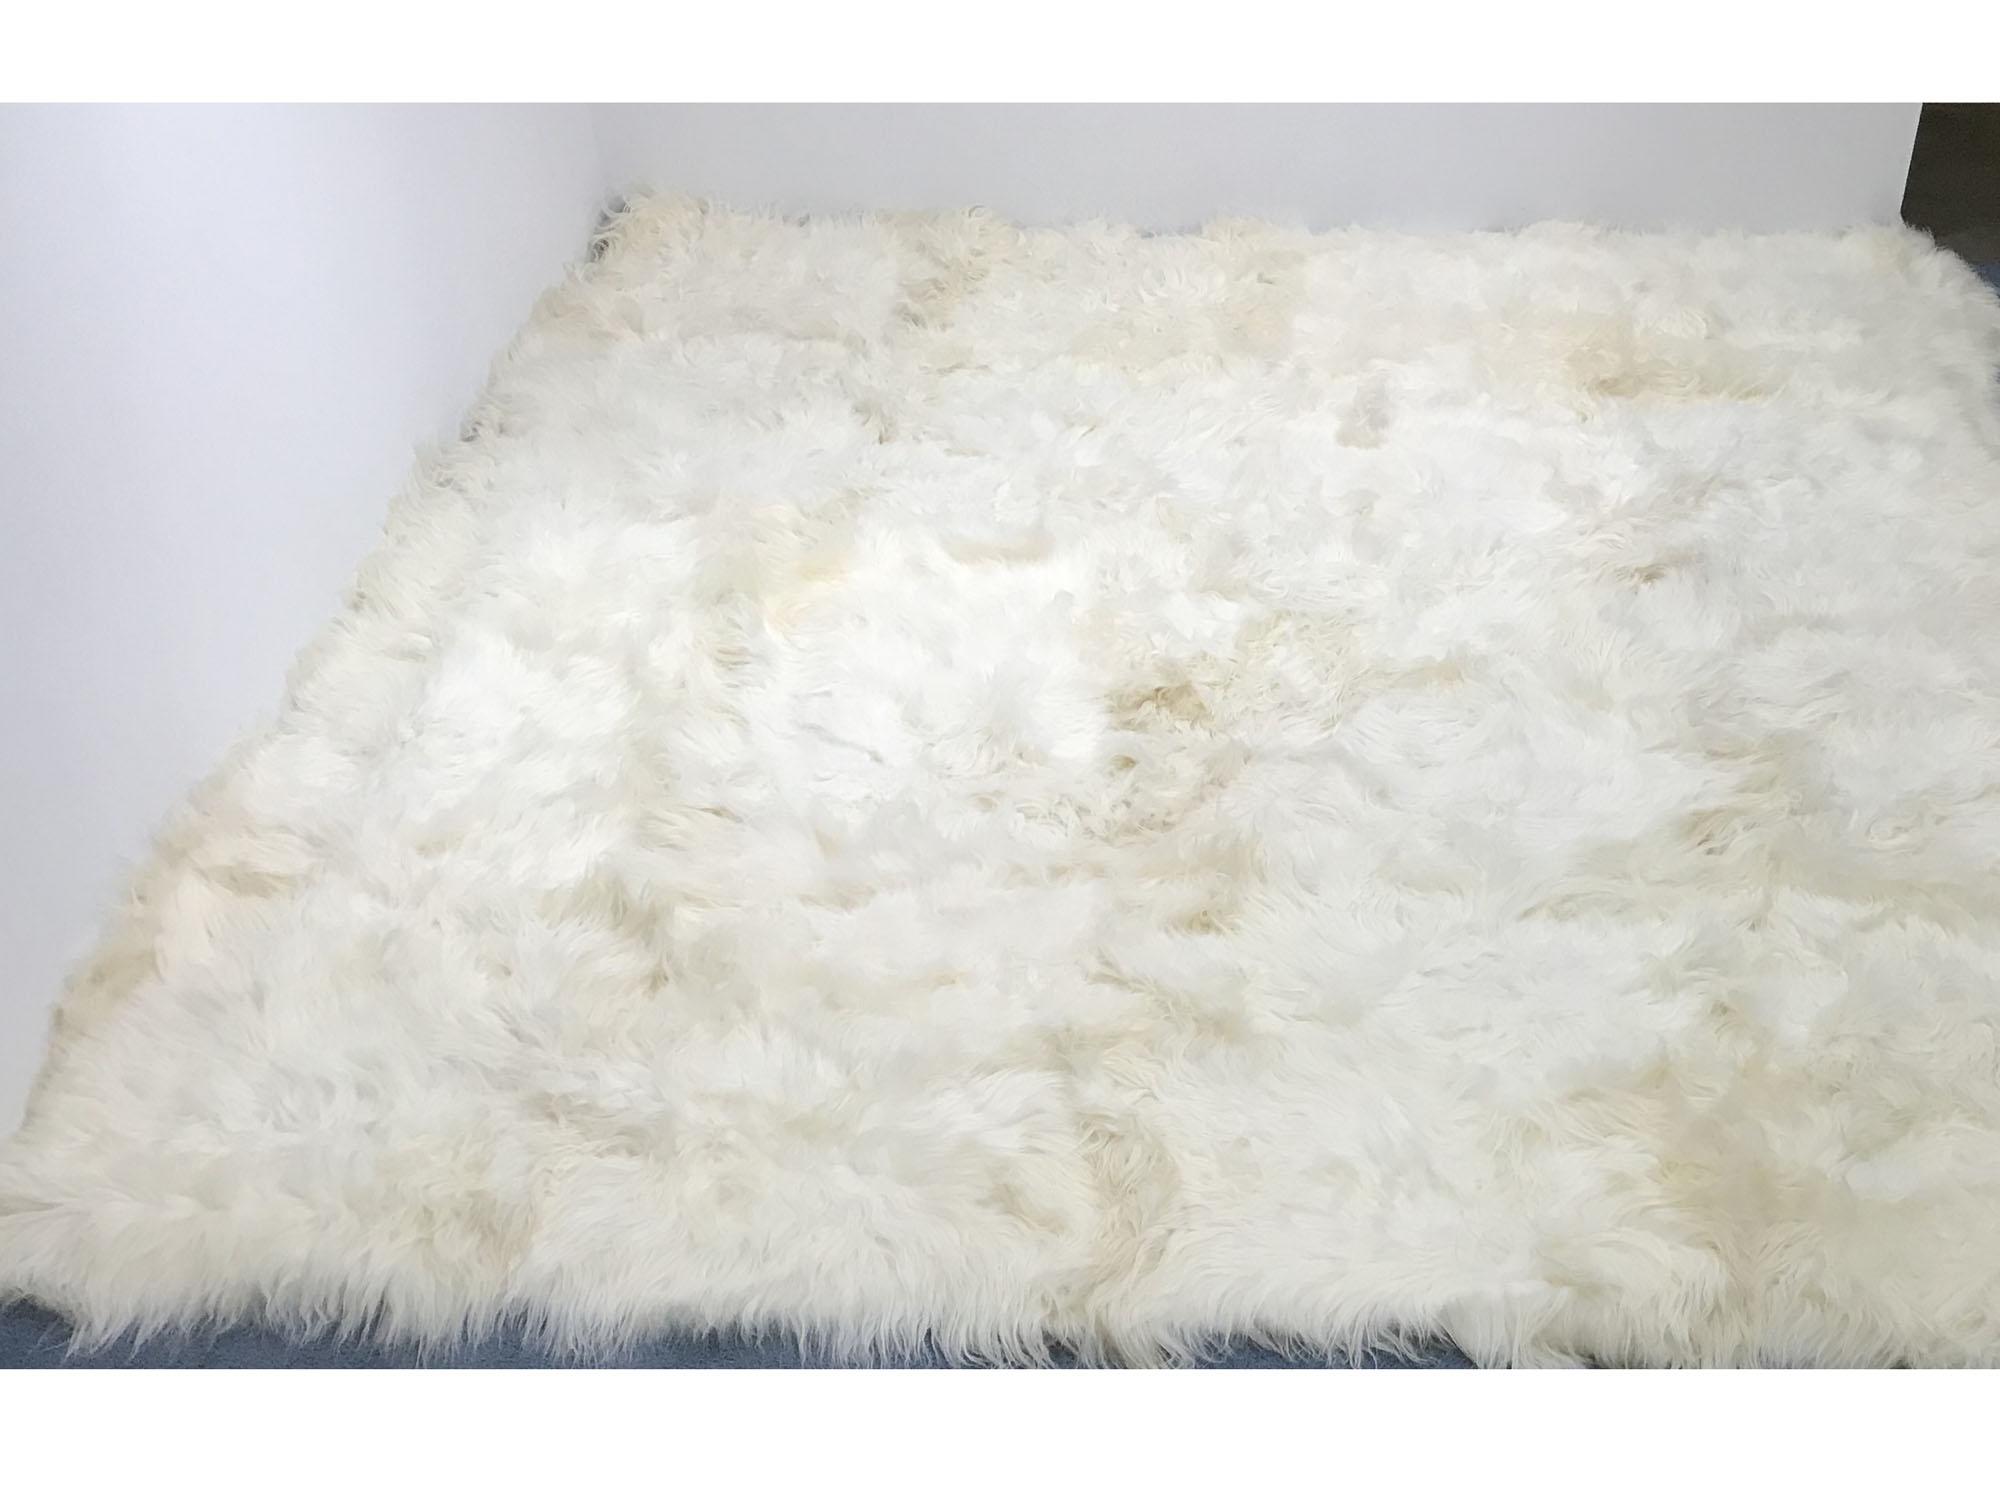 Icelandic Sheepskin Rug 12x12 Ft